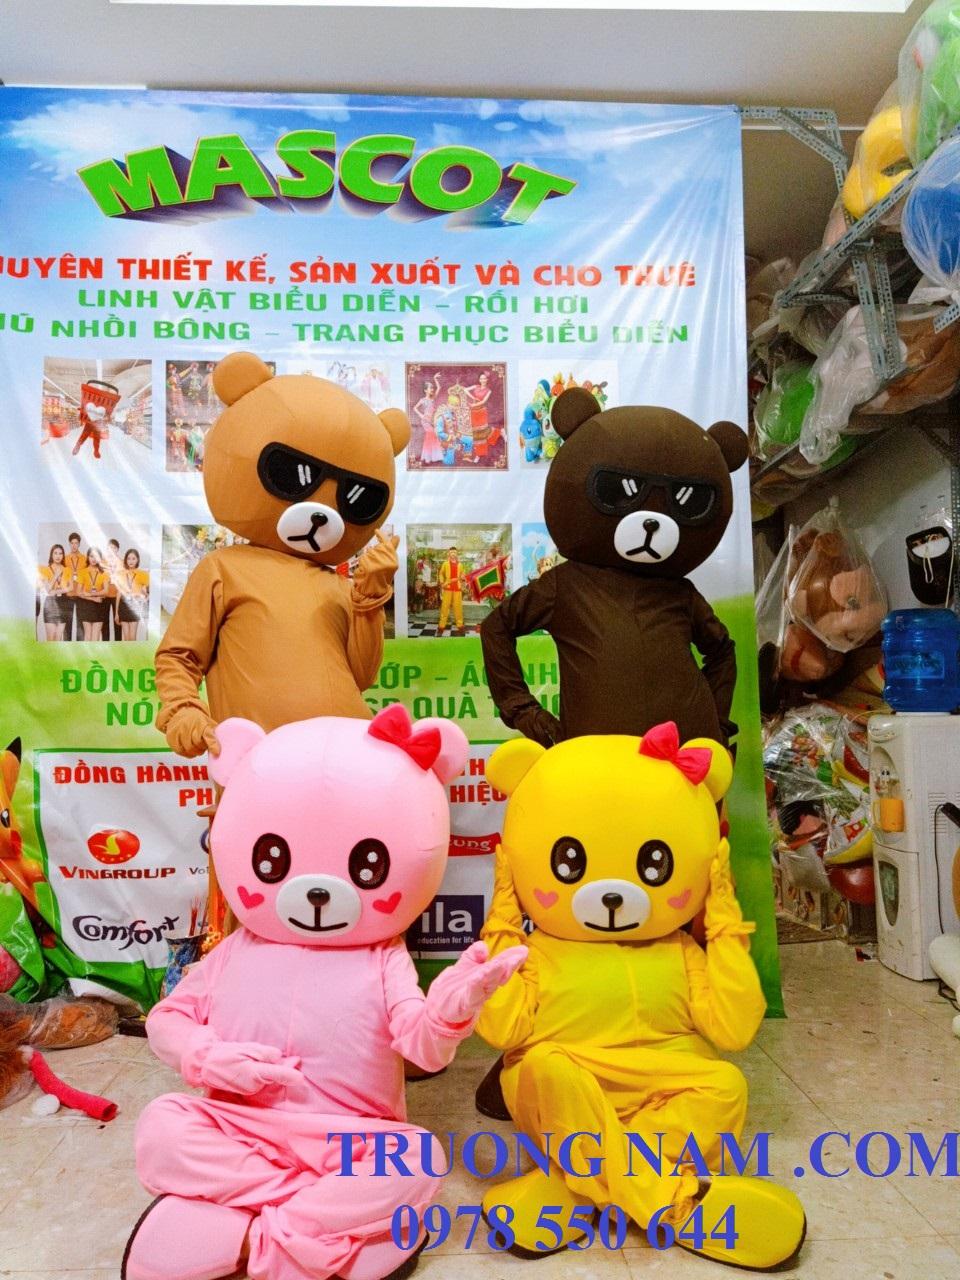 Cho thuê mascot gấu lầy Tiktok